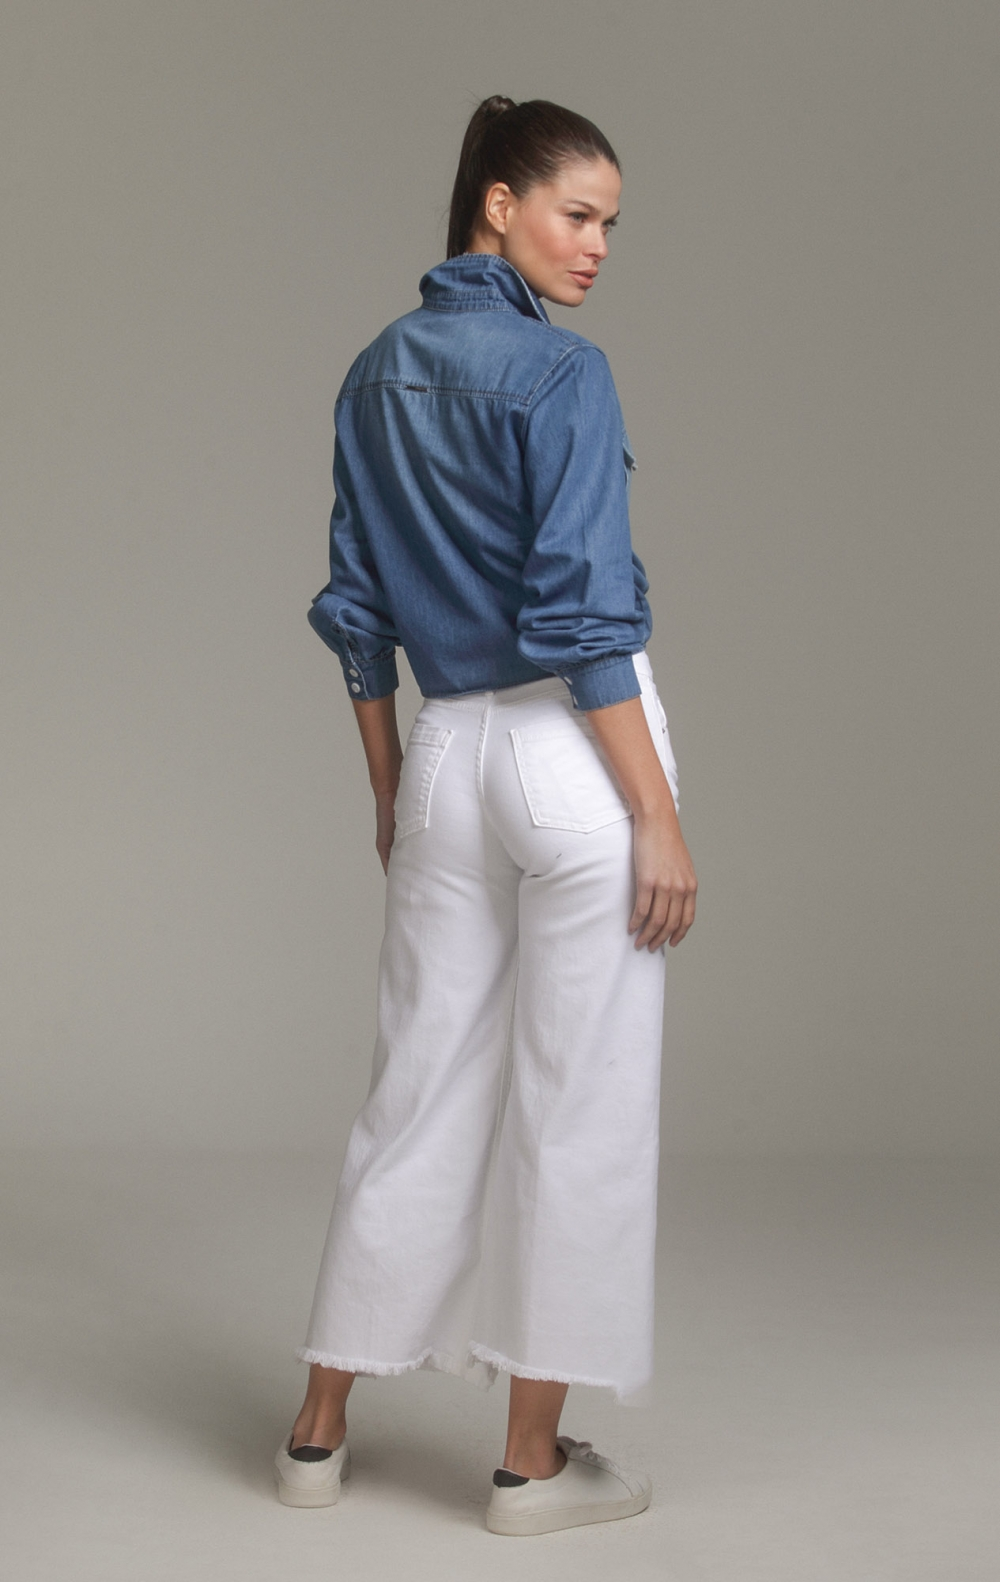 Camisa Tuca Tencel Jeans - Foto 2